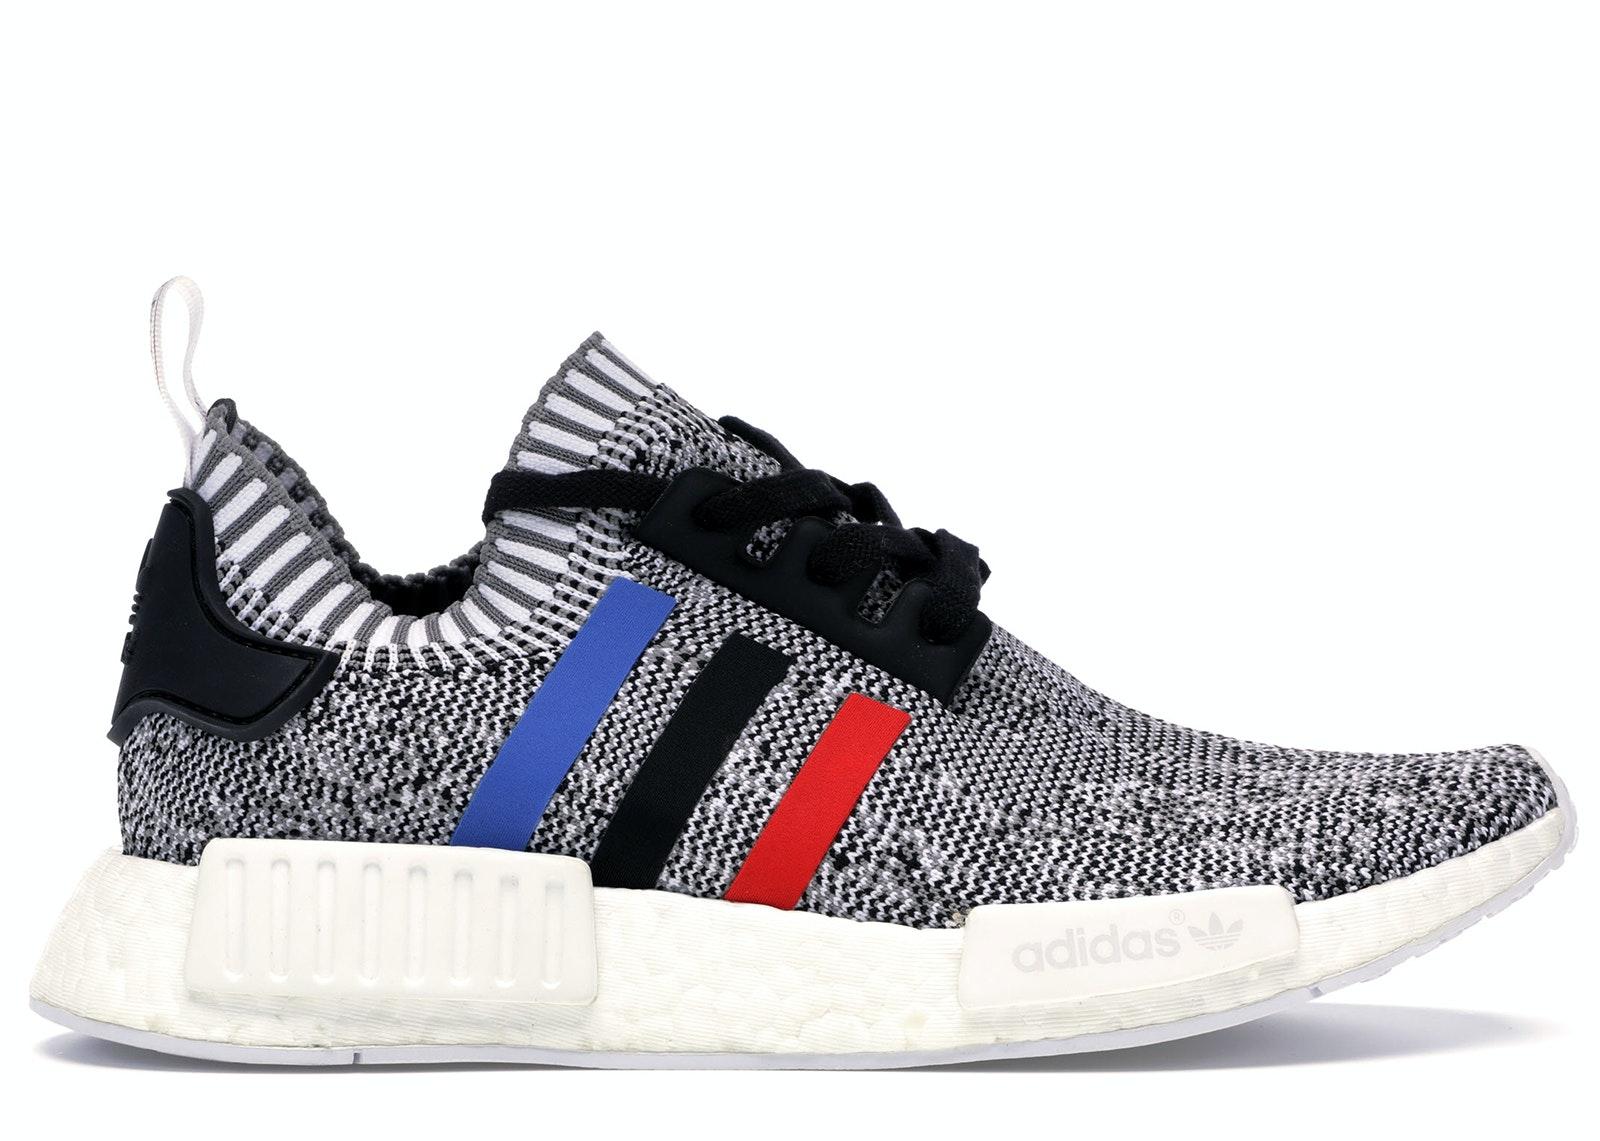 adidas NMD R1 Tri Color Stripes White